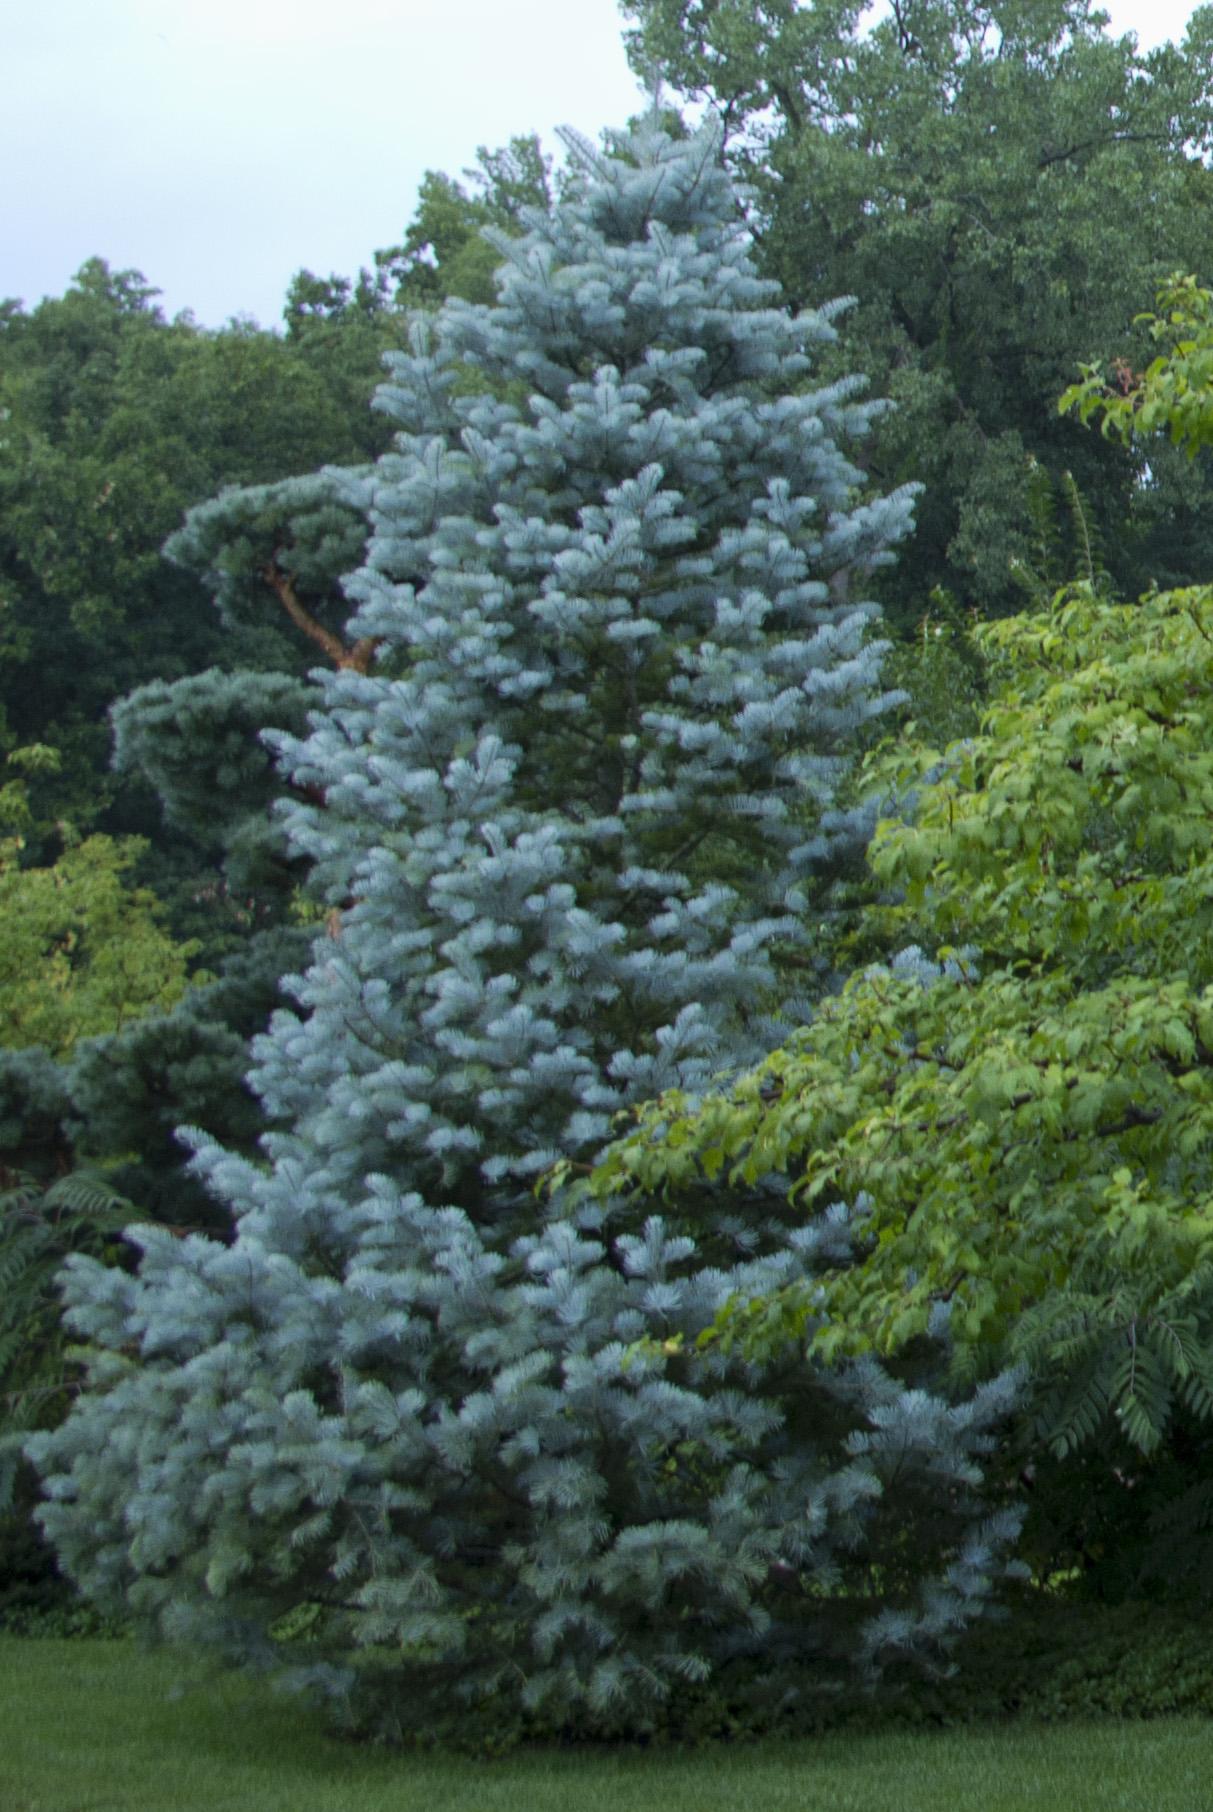 Ornamental evergreen trees - Ornamental Evergreen Trees 17